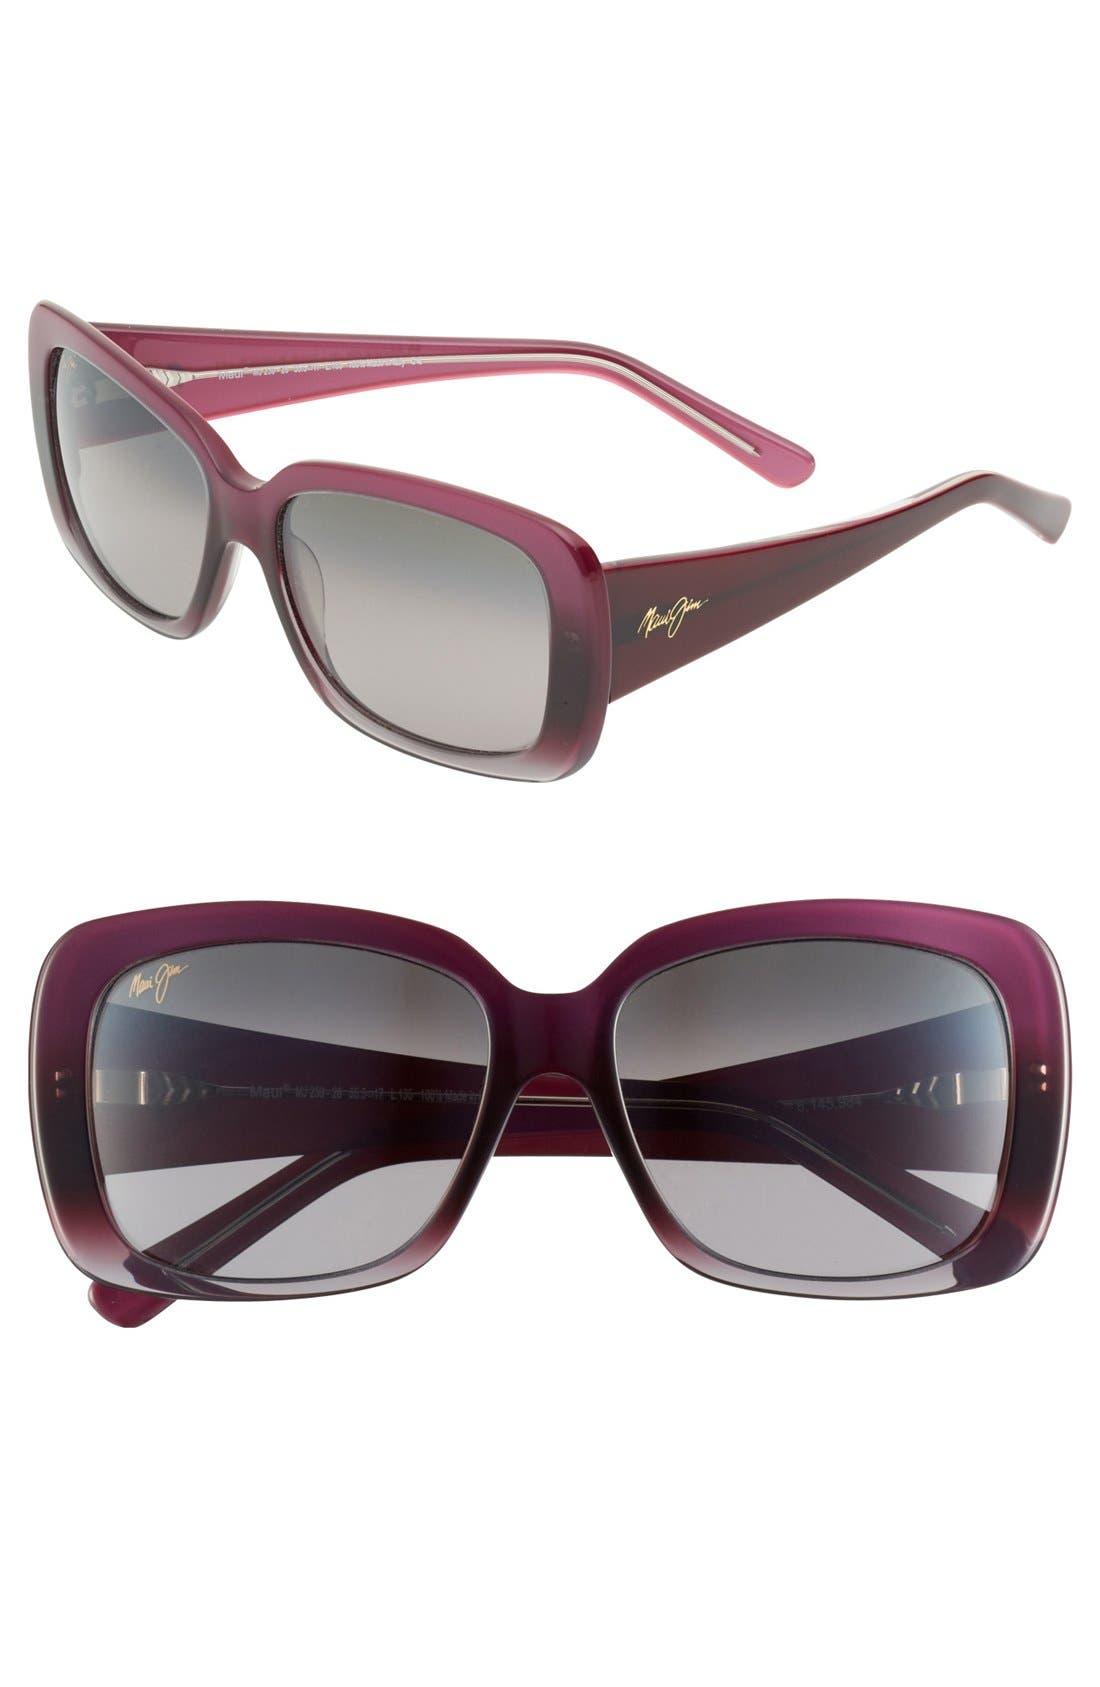 Alternate Image 1 Selected - Maui Jim 'Lani' 56mm Oversized Sunglasses